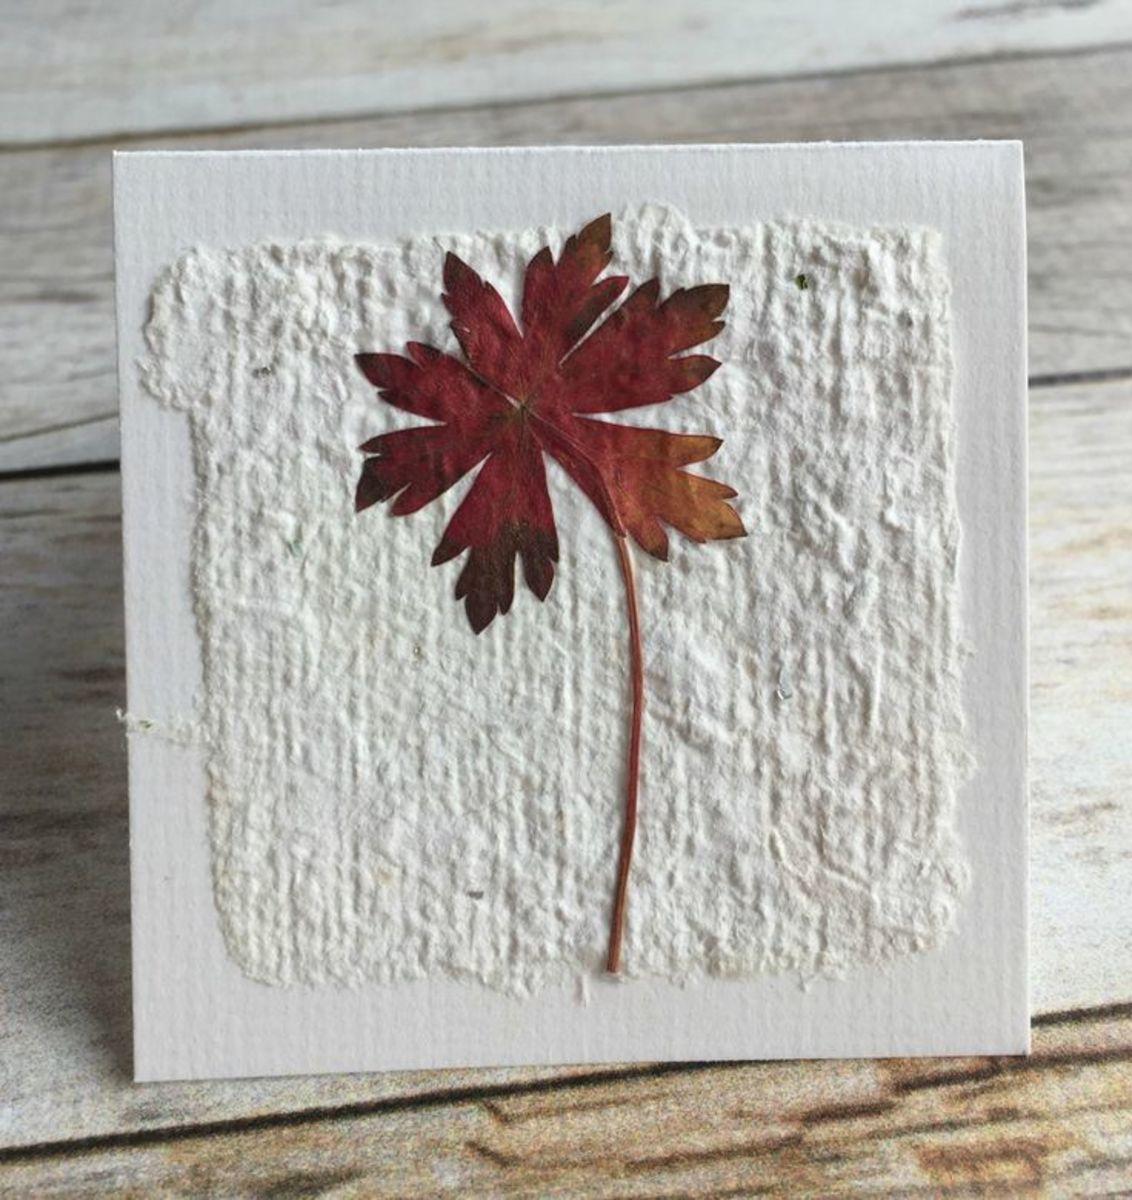 paper-casting-amazing-art-paper-sculpture-allen-betty-eckman